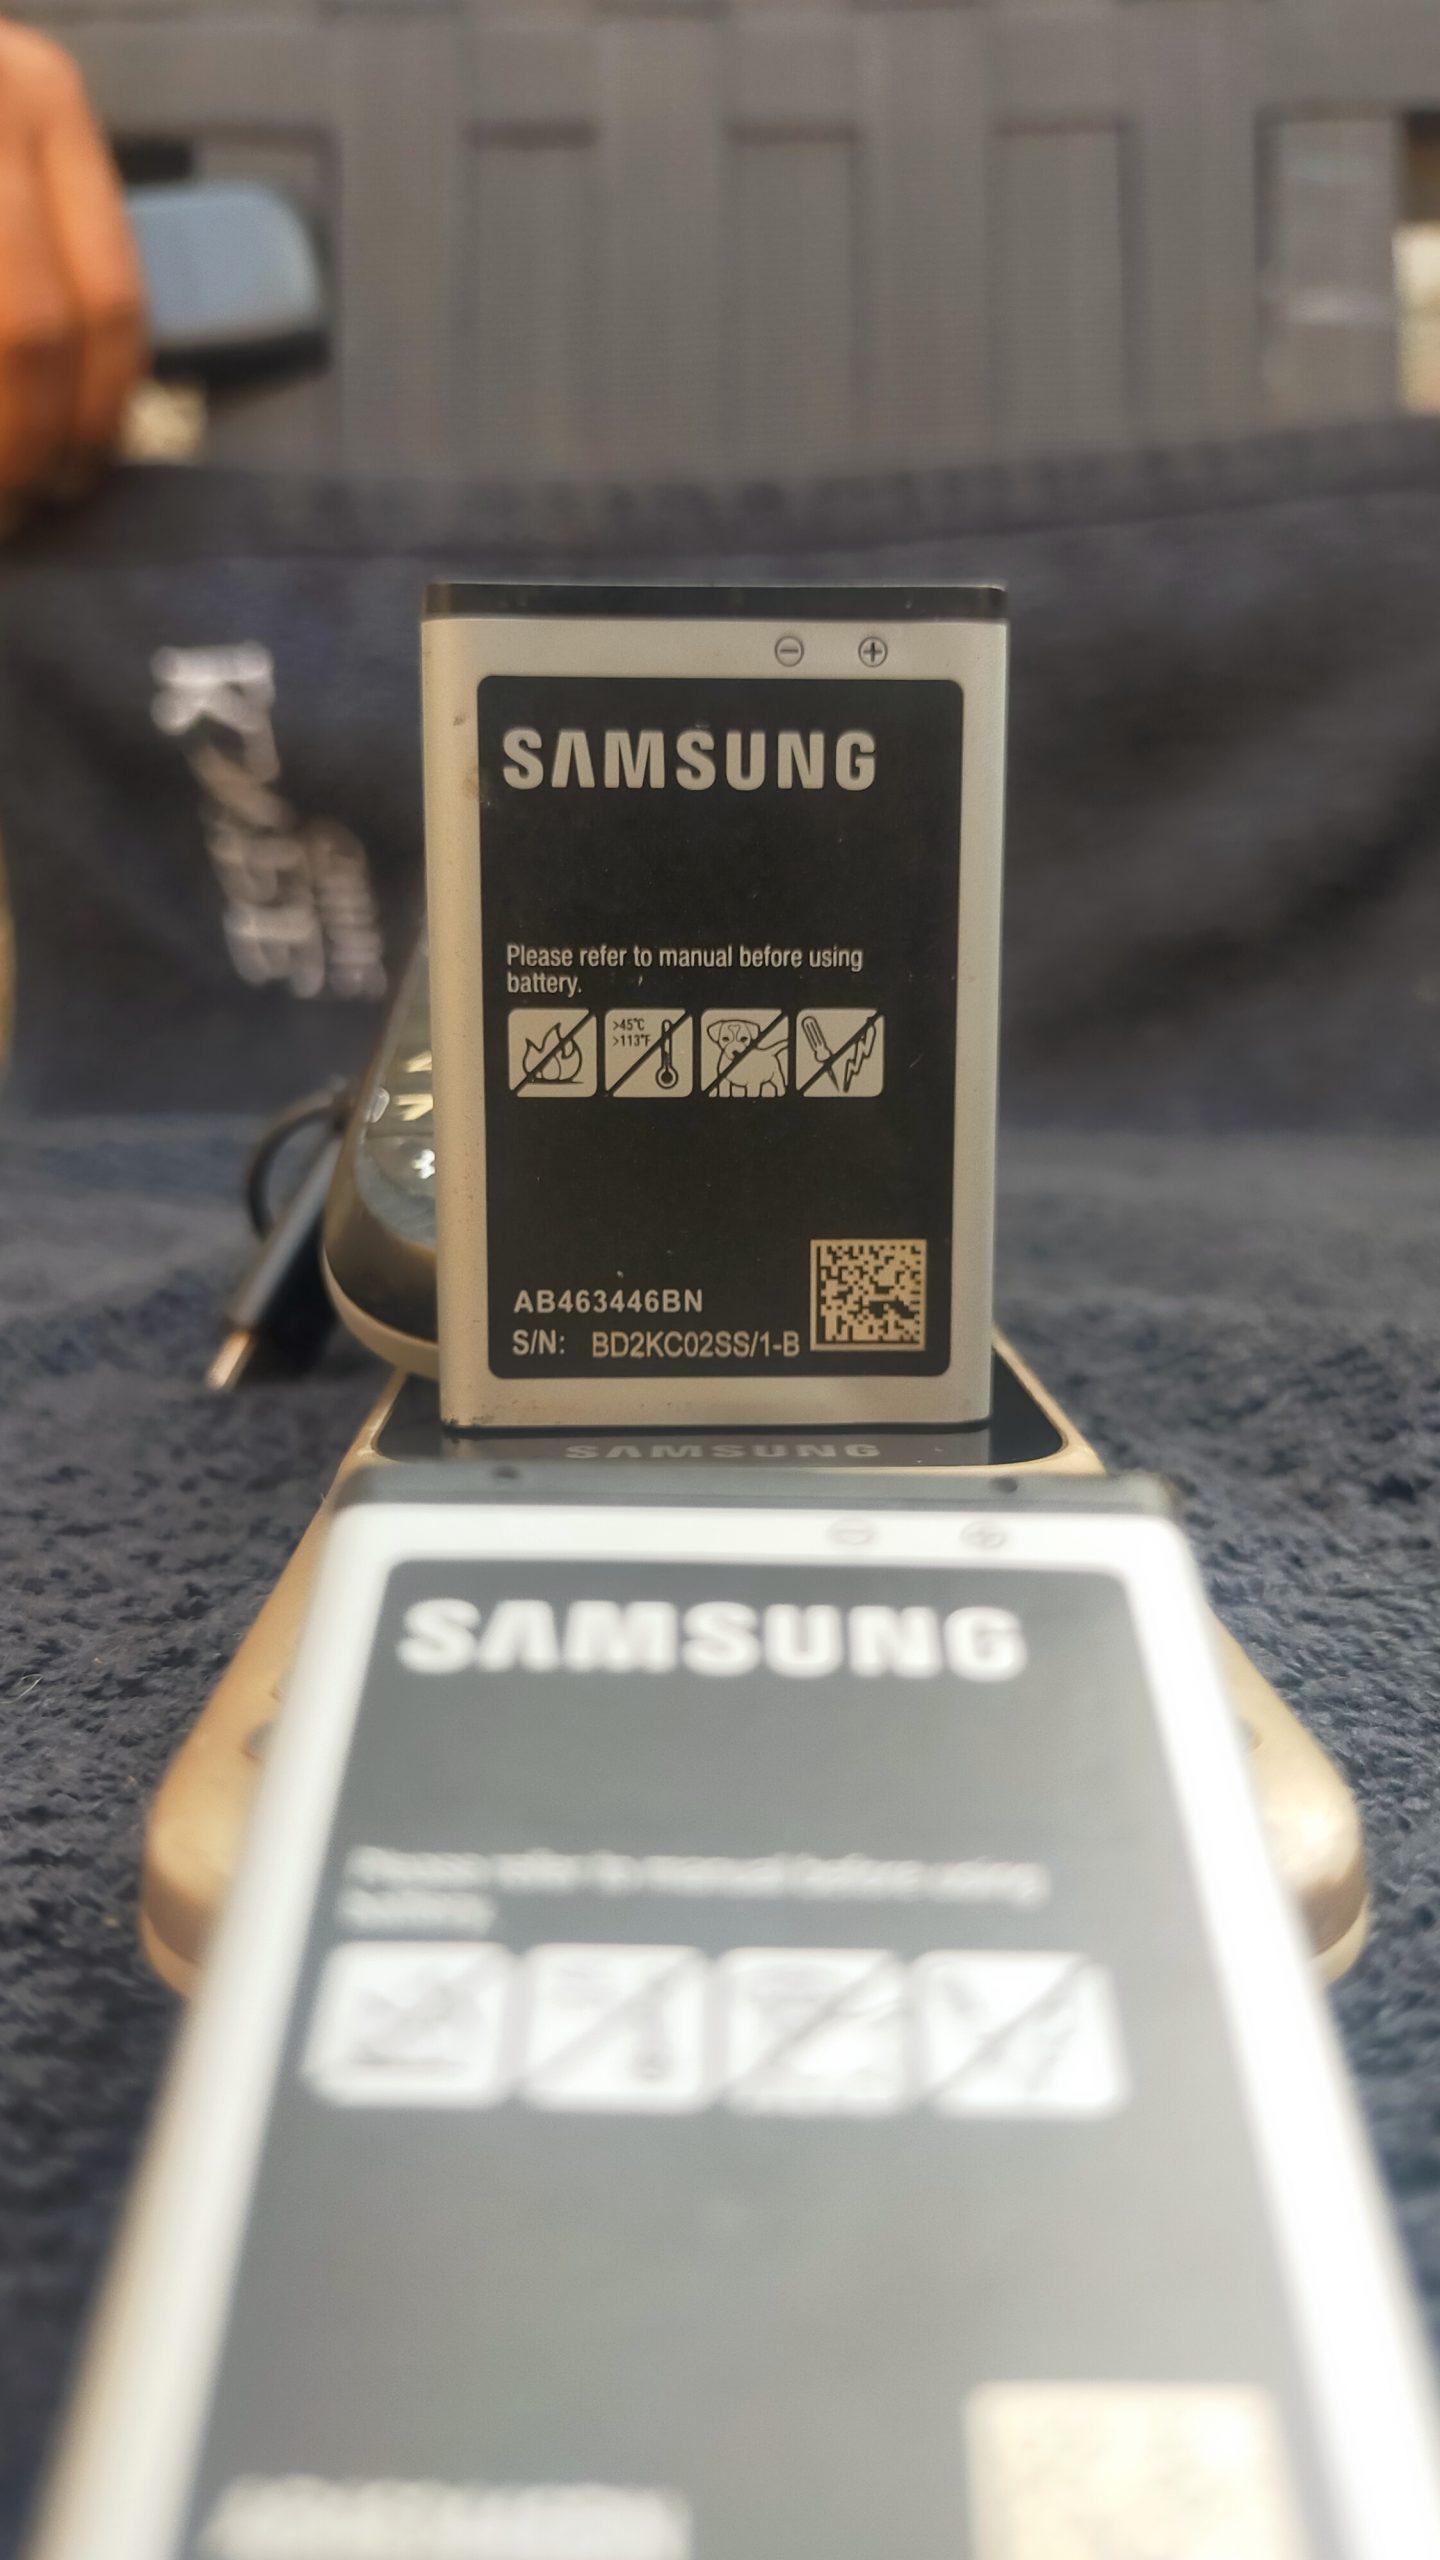 Samsung mobile phone batteries